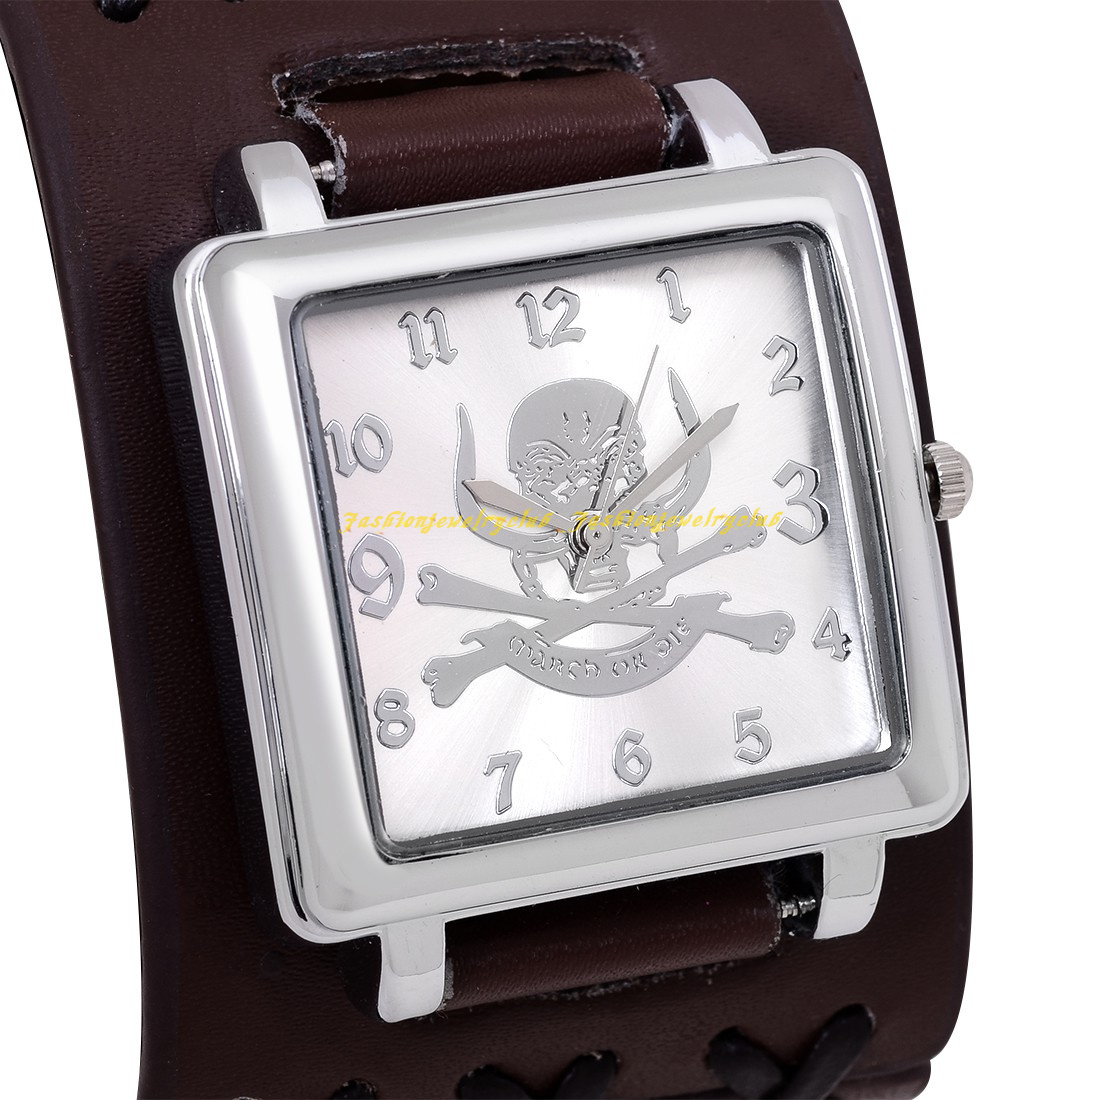 brown_leather_band_quartz_wrist_watch_men_women_punk_skull_digital_dial_watches_4.jpg